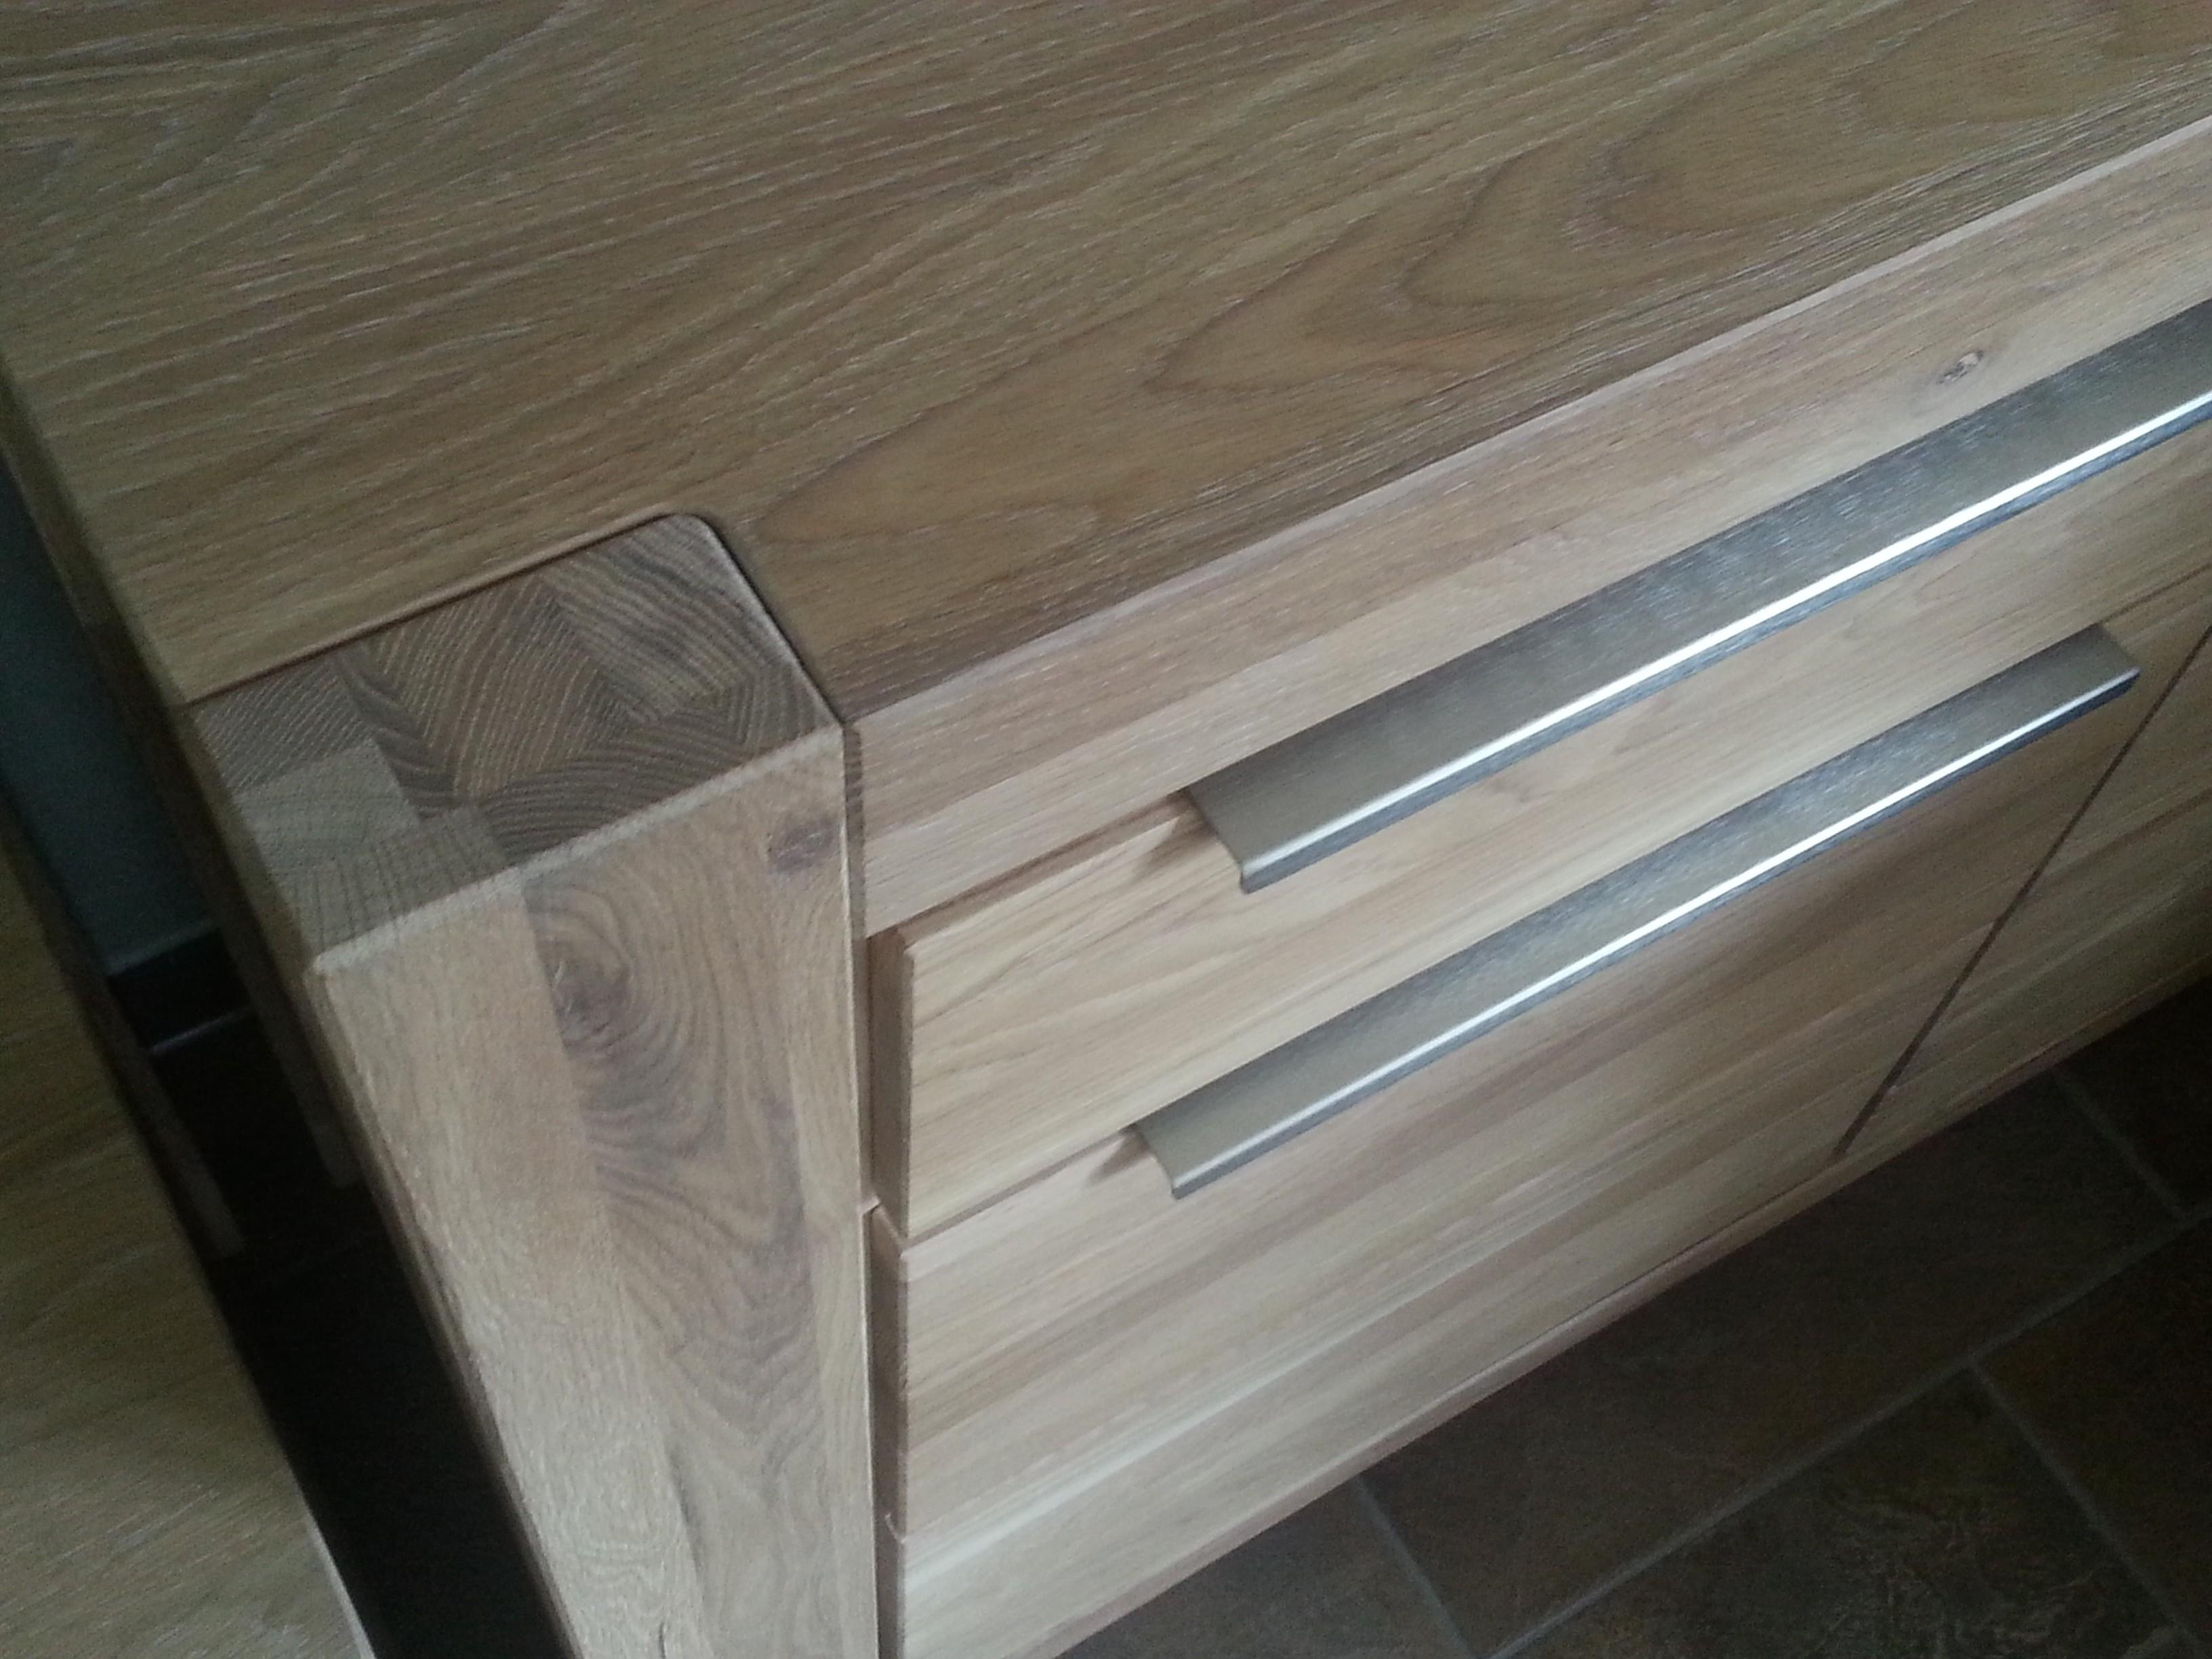 regal wildeiche sonoma s gerauh massivholz 2662 elfo m bel nena massivholz. Black Bedroom Furniture Sets. Home Design Ideas